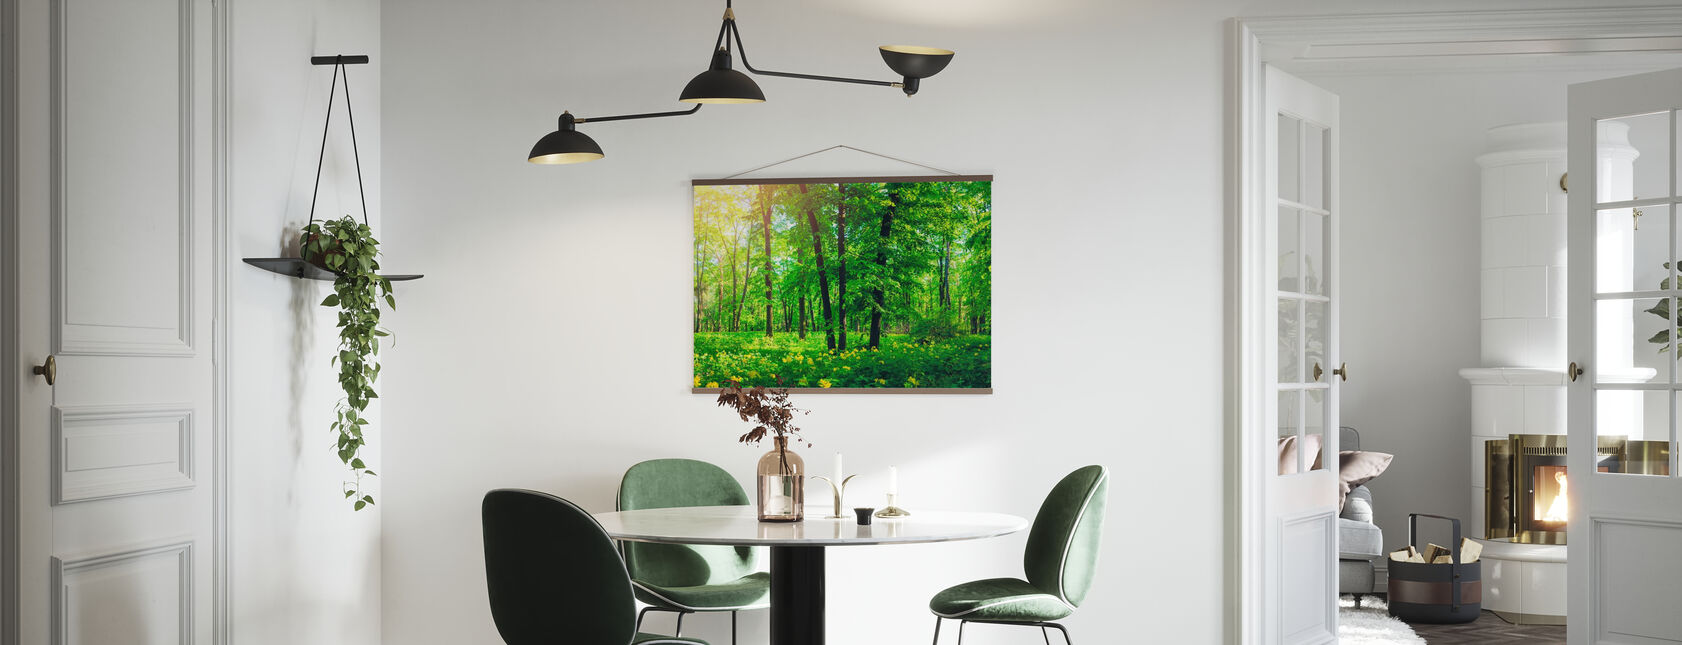 Green Forest in Summer - Poster - Kitchen